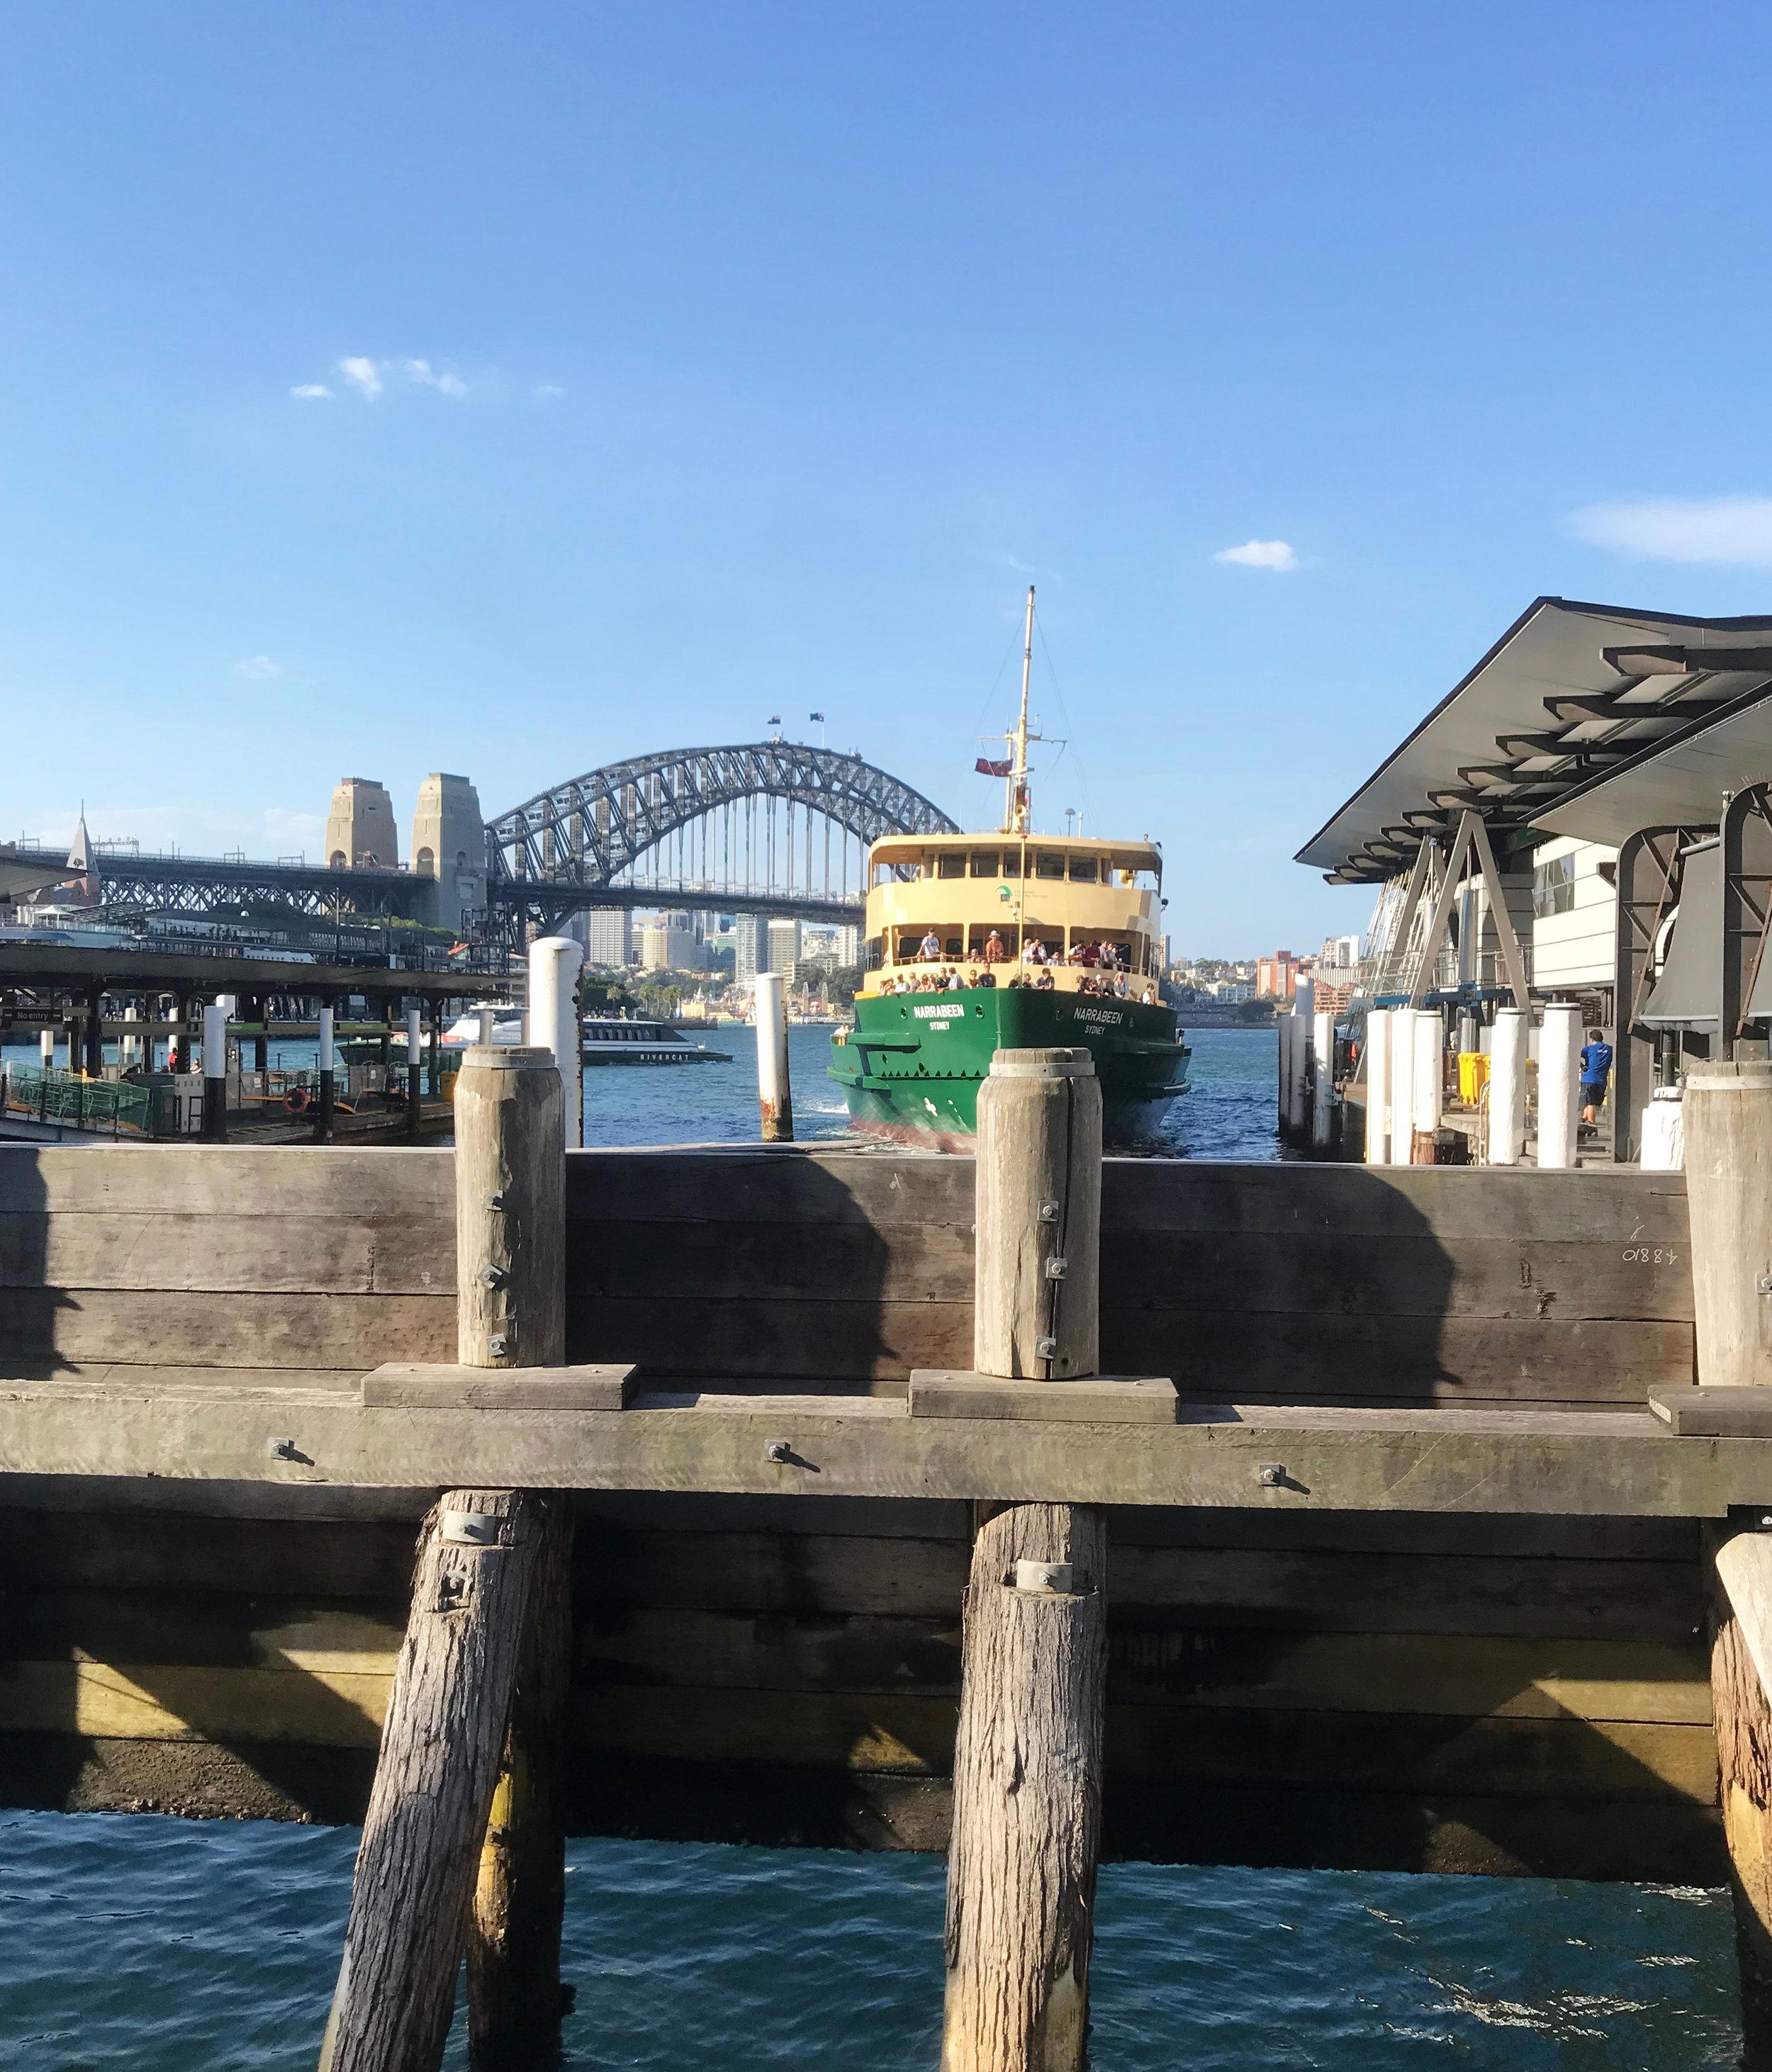 manly ferry.jpg